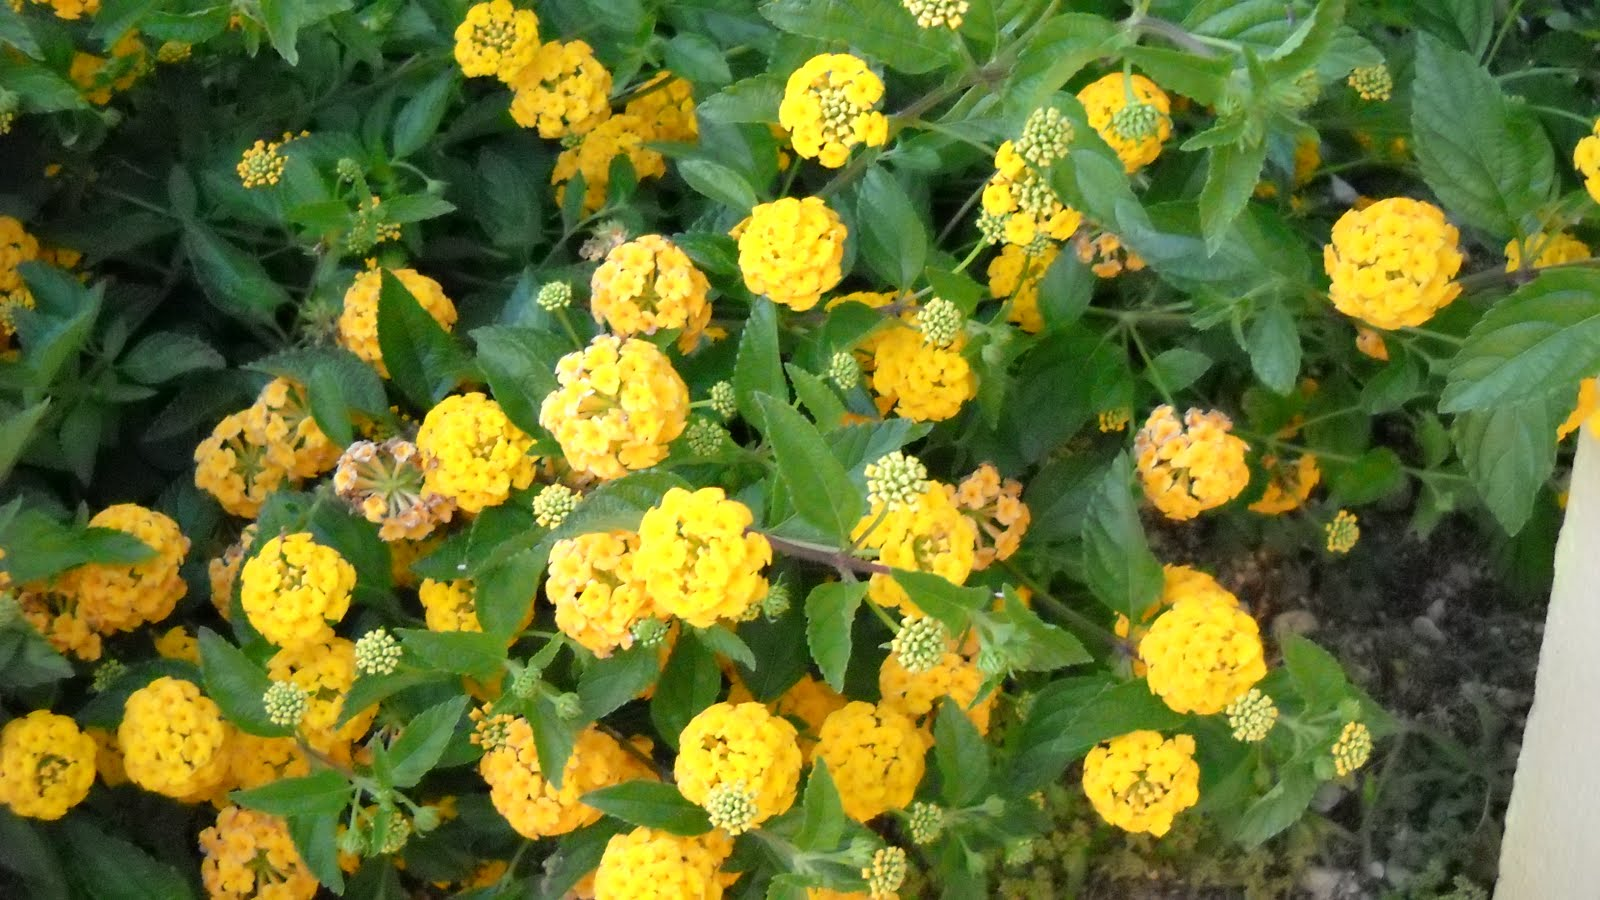 arbusto fechado pleno de flores que atraiem uma variedade de insectos